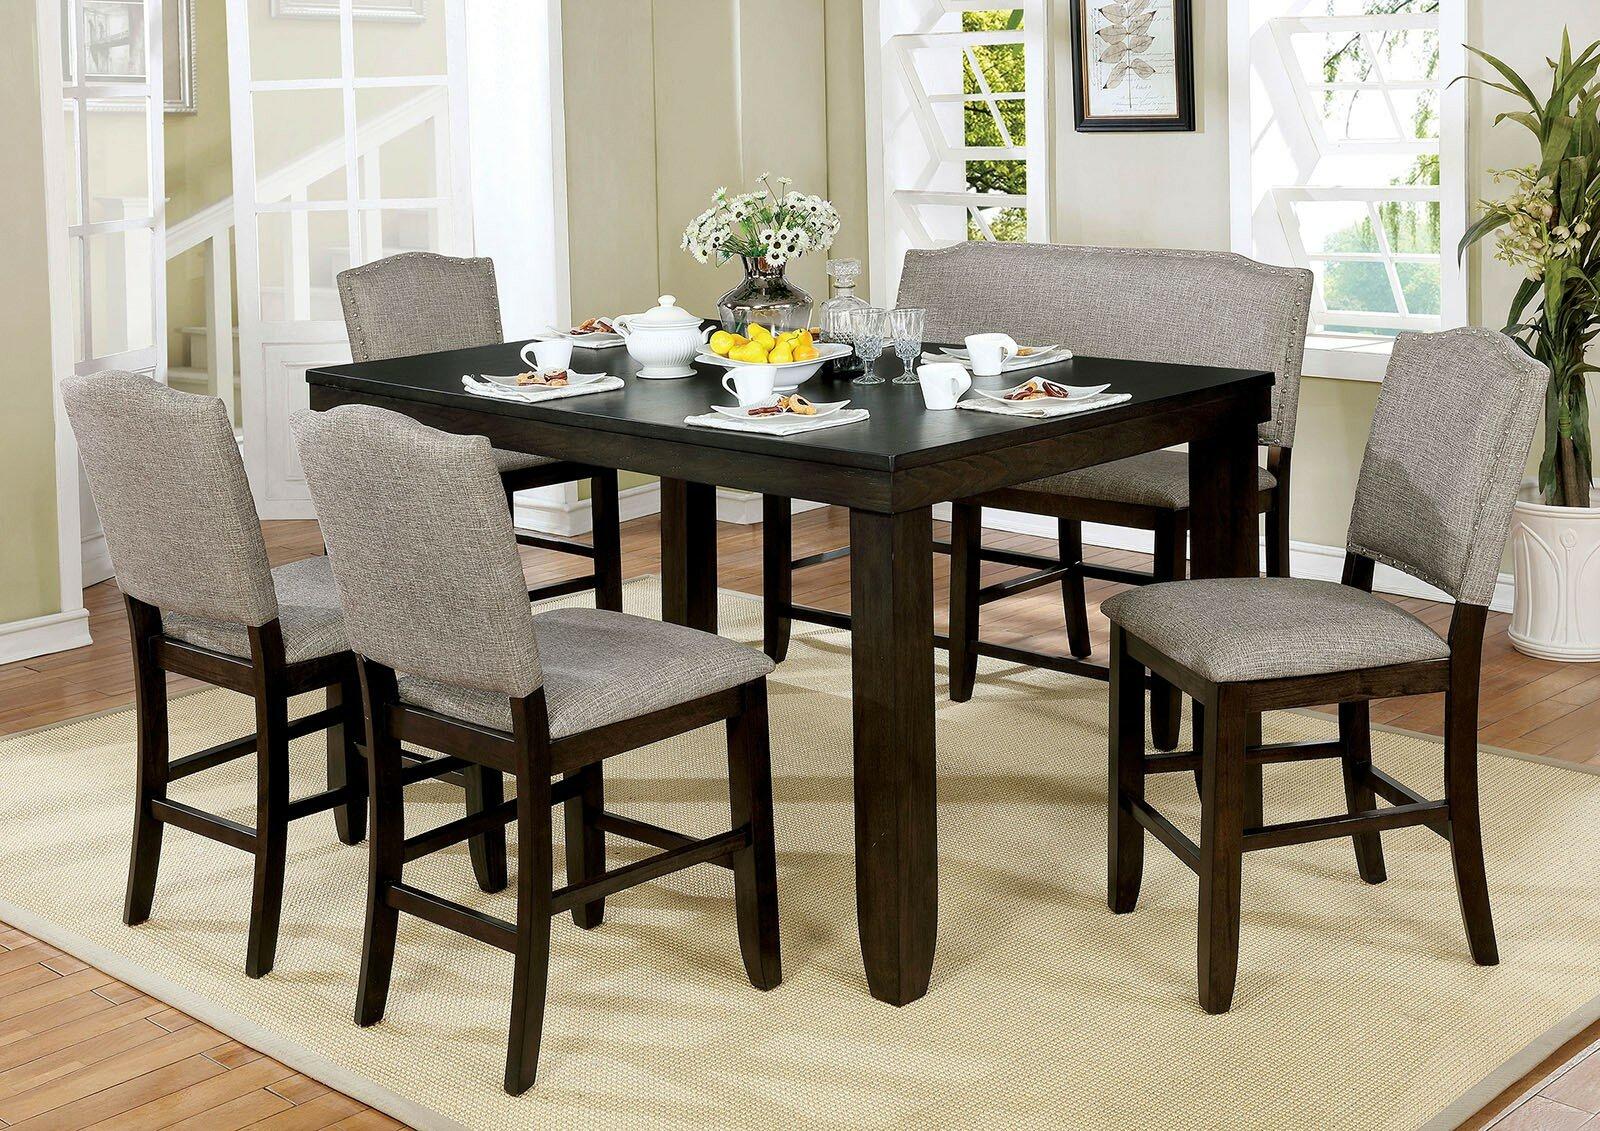 Marvelous Canora Grey Len 6 Piece Counter Height Drop Leaf Breakfast Creativecarmelina Interior Chair Design Creativecarmelinacom